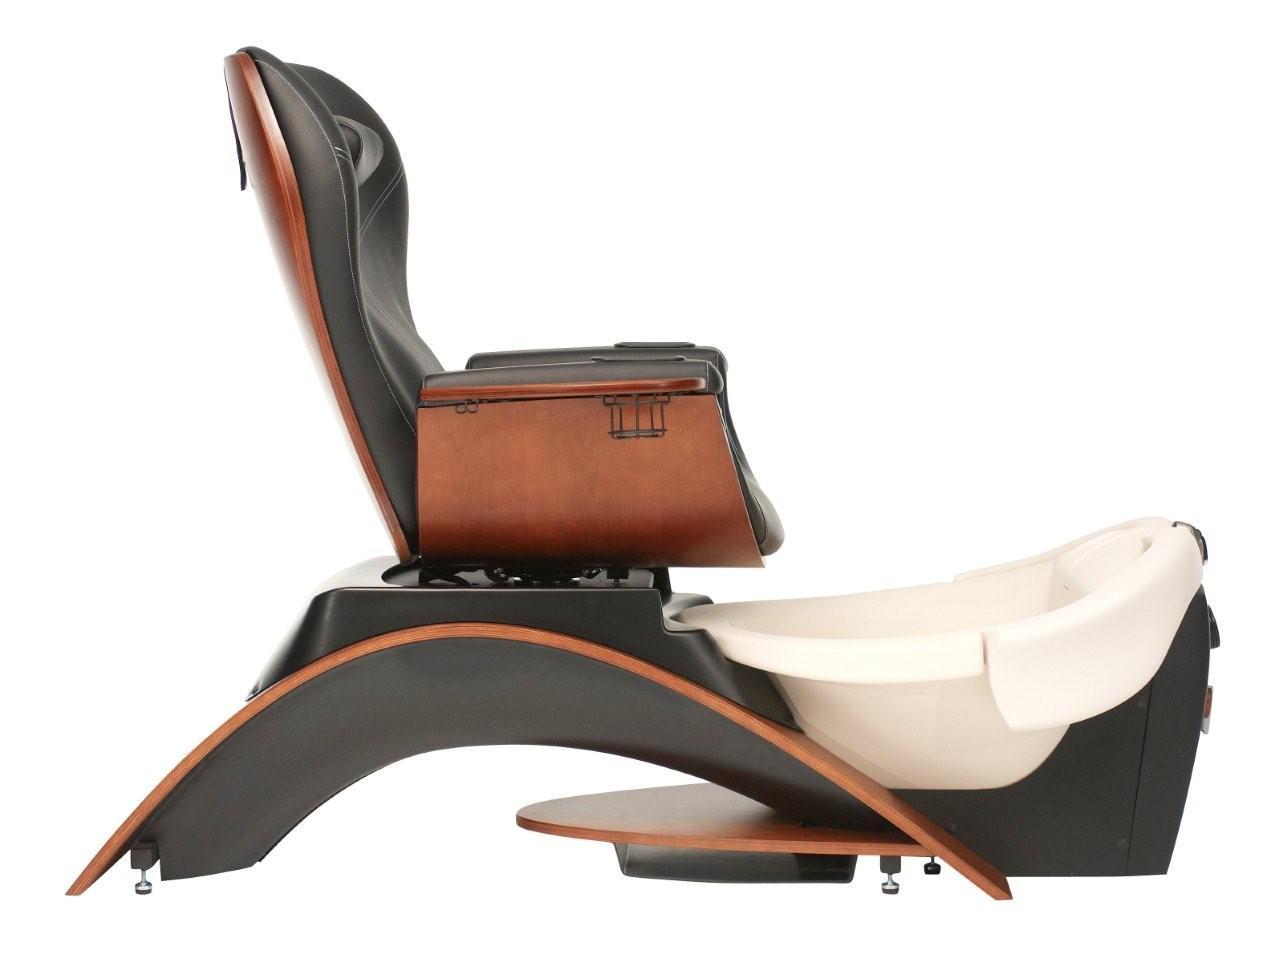 Marketplace for Pedicure Chair Spa Equipment | Pedicure ...